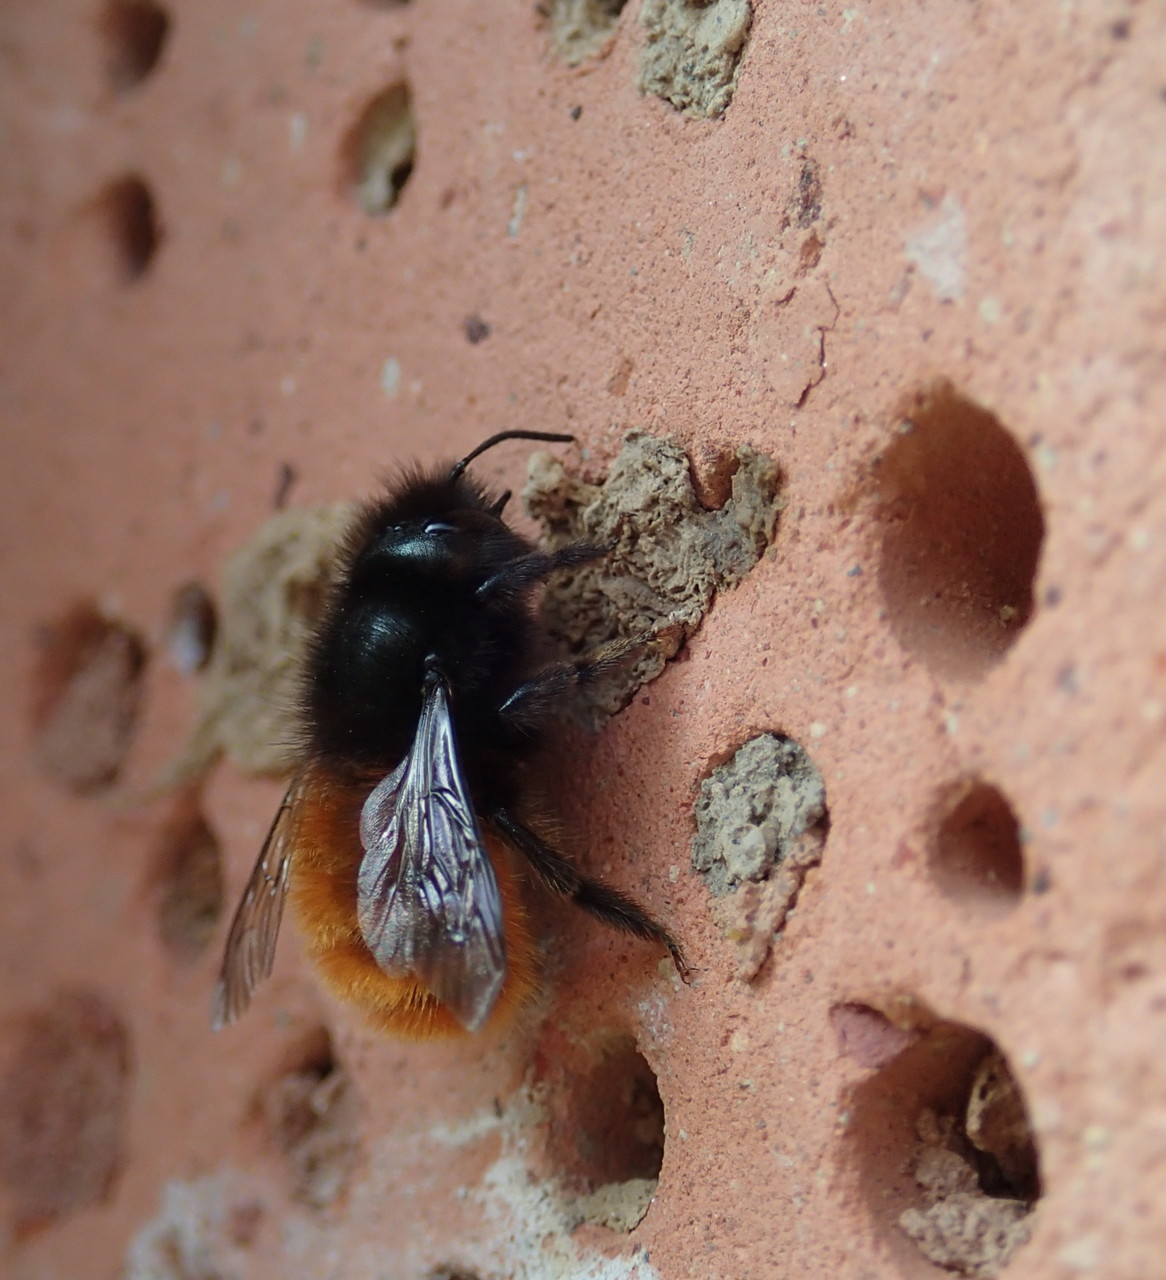 Gehörnte Mauerbiene - Foto: Félix Girault